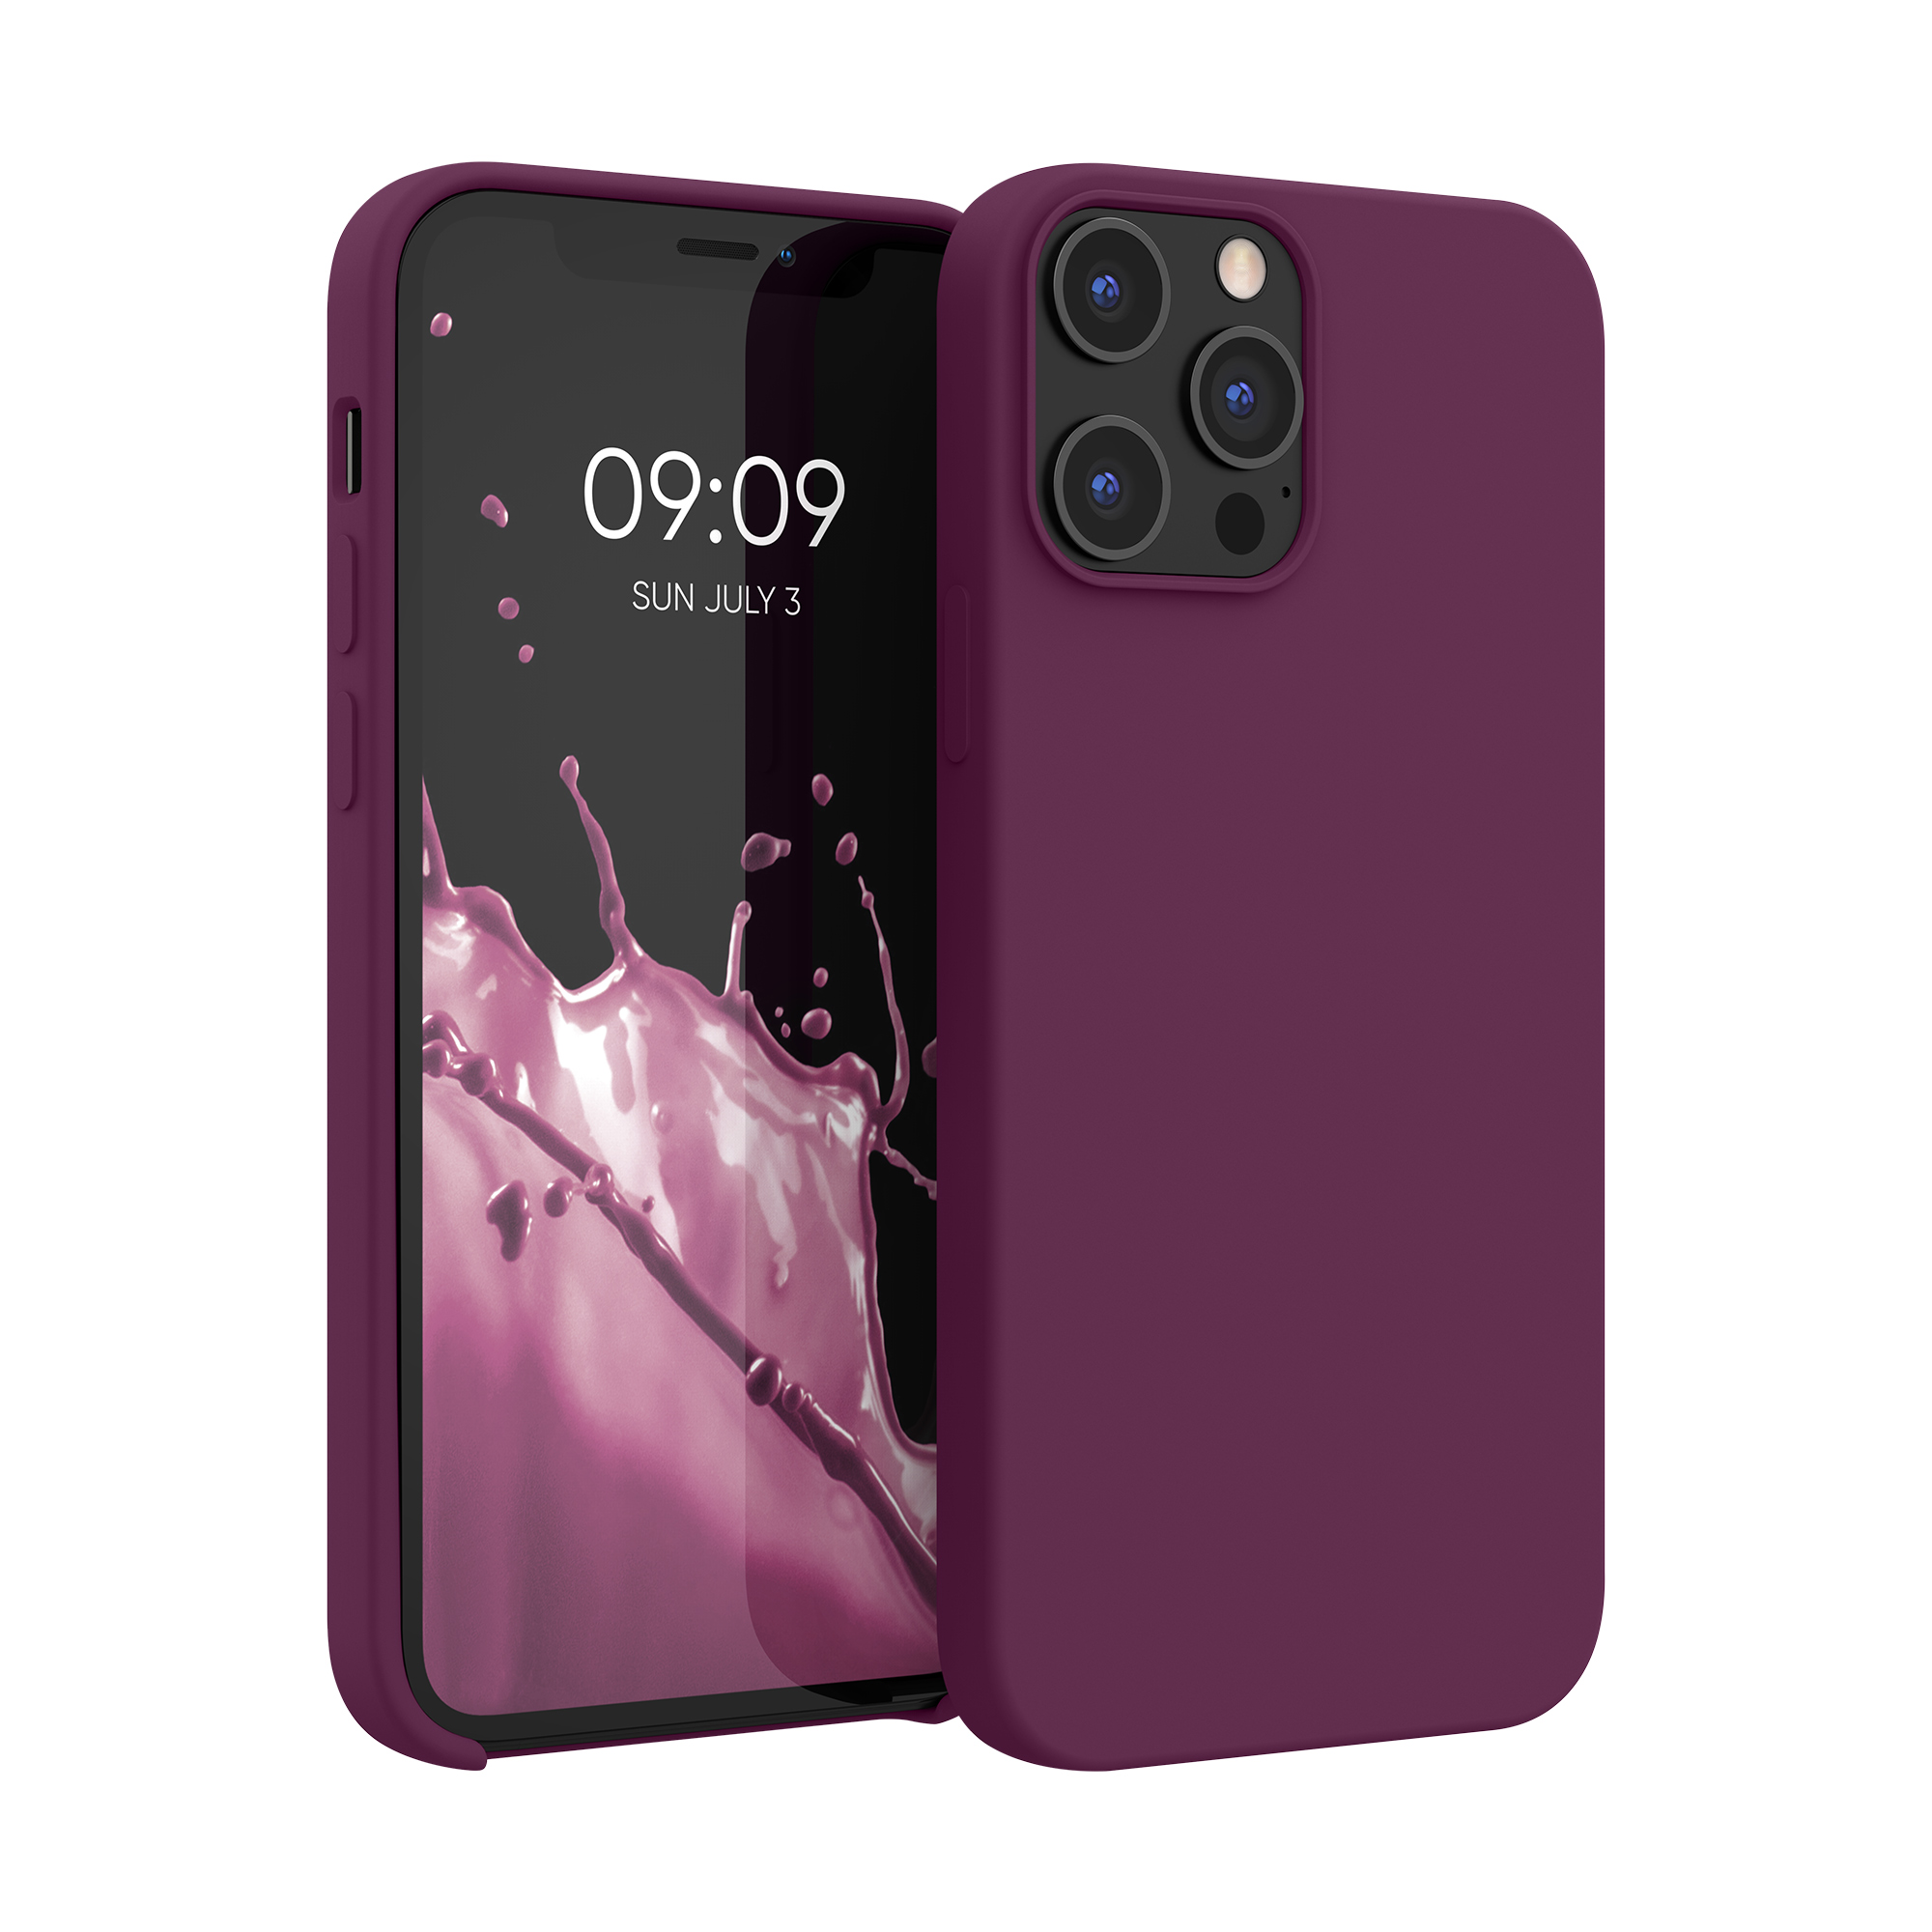 Kvalitní silikonové TPU pouzdro pro Apple iPhone 12 Pro Max - Bordeaux Violet